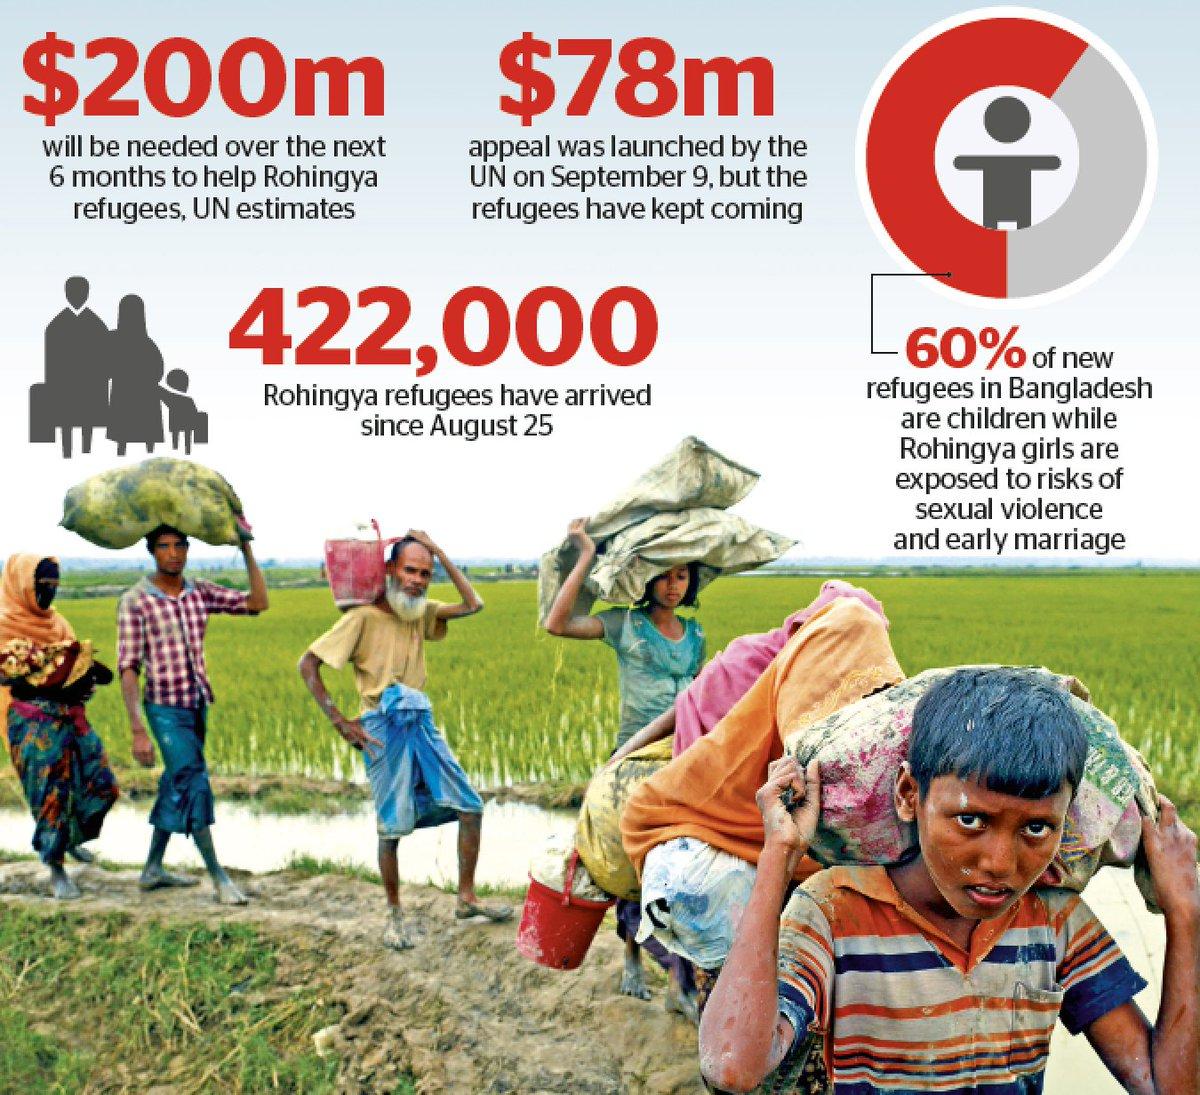 Rohingya refugees still counting on Suu Kyi to save them (https://pbs.twimg.com/media/DKYIyNiWsAYhnqX.jpg)